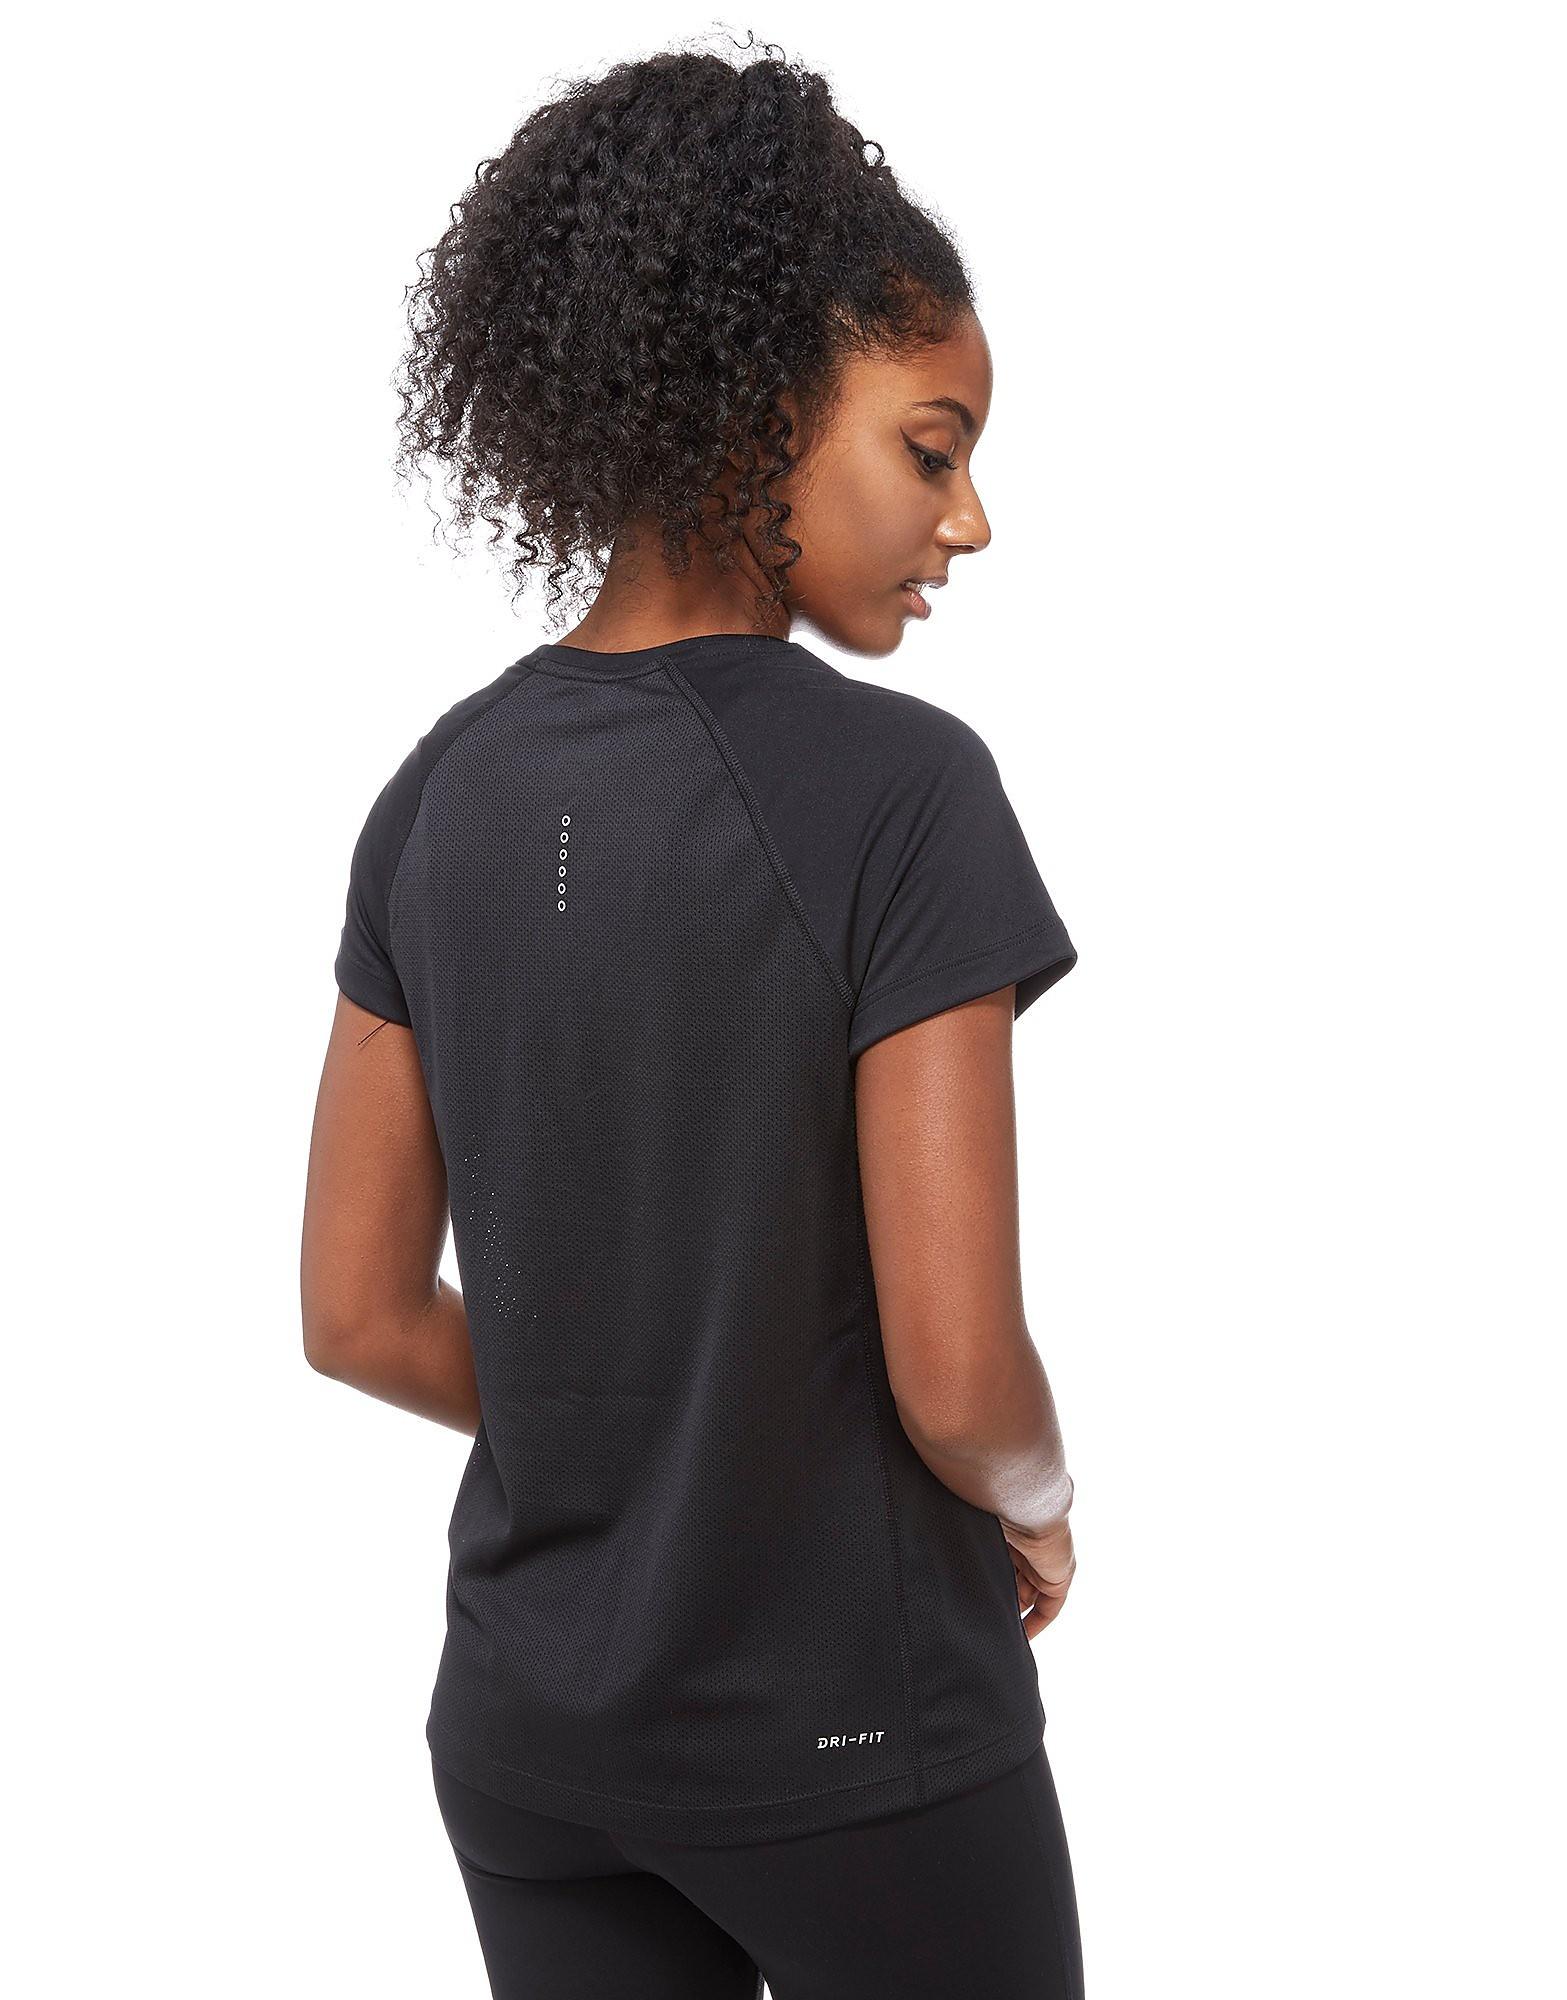 Nike Dry Miler Short Sleeve Running Top